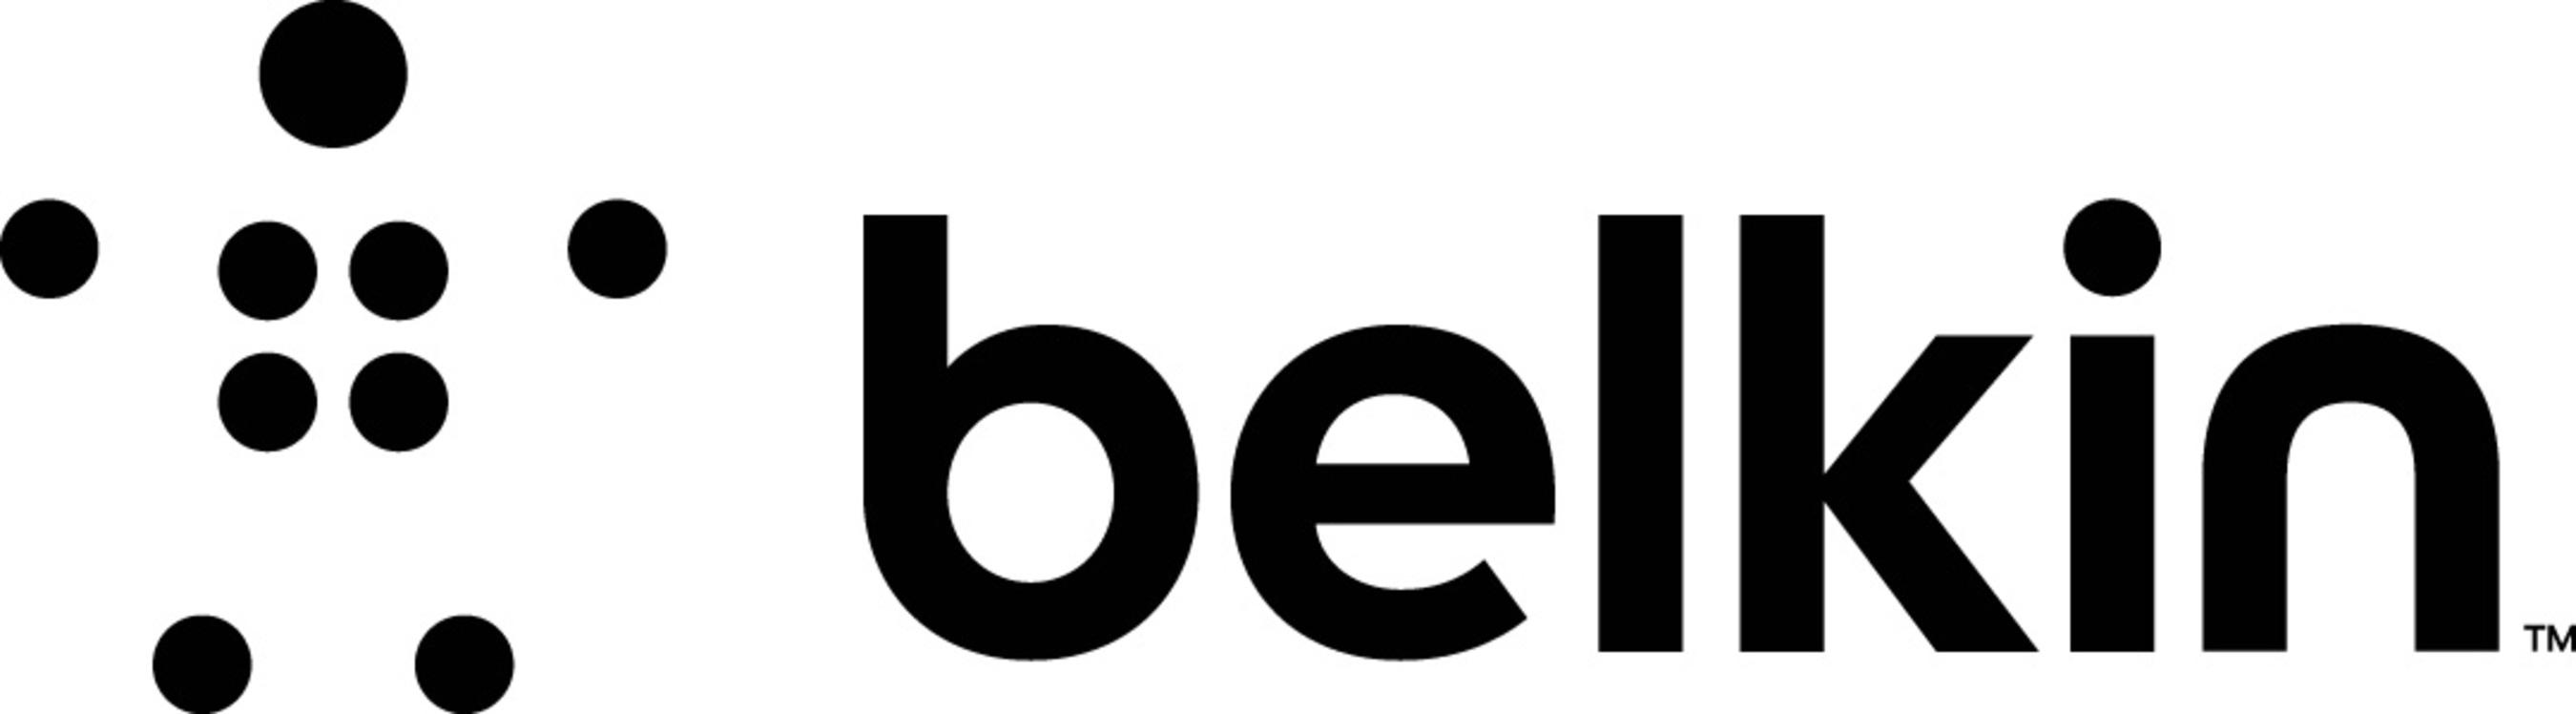 Belkins Portfolio Of Secure Kvm Switching Solutions Earns Niap